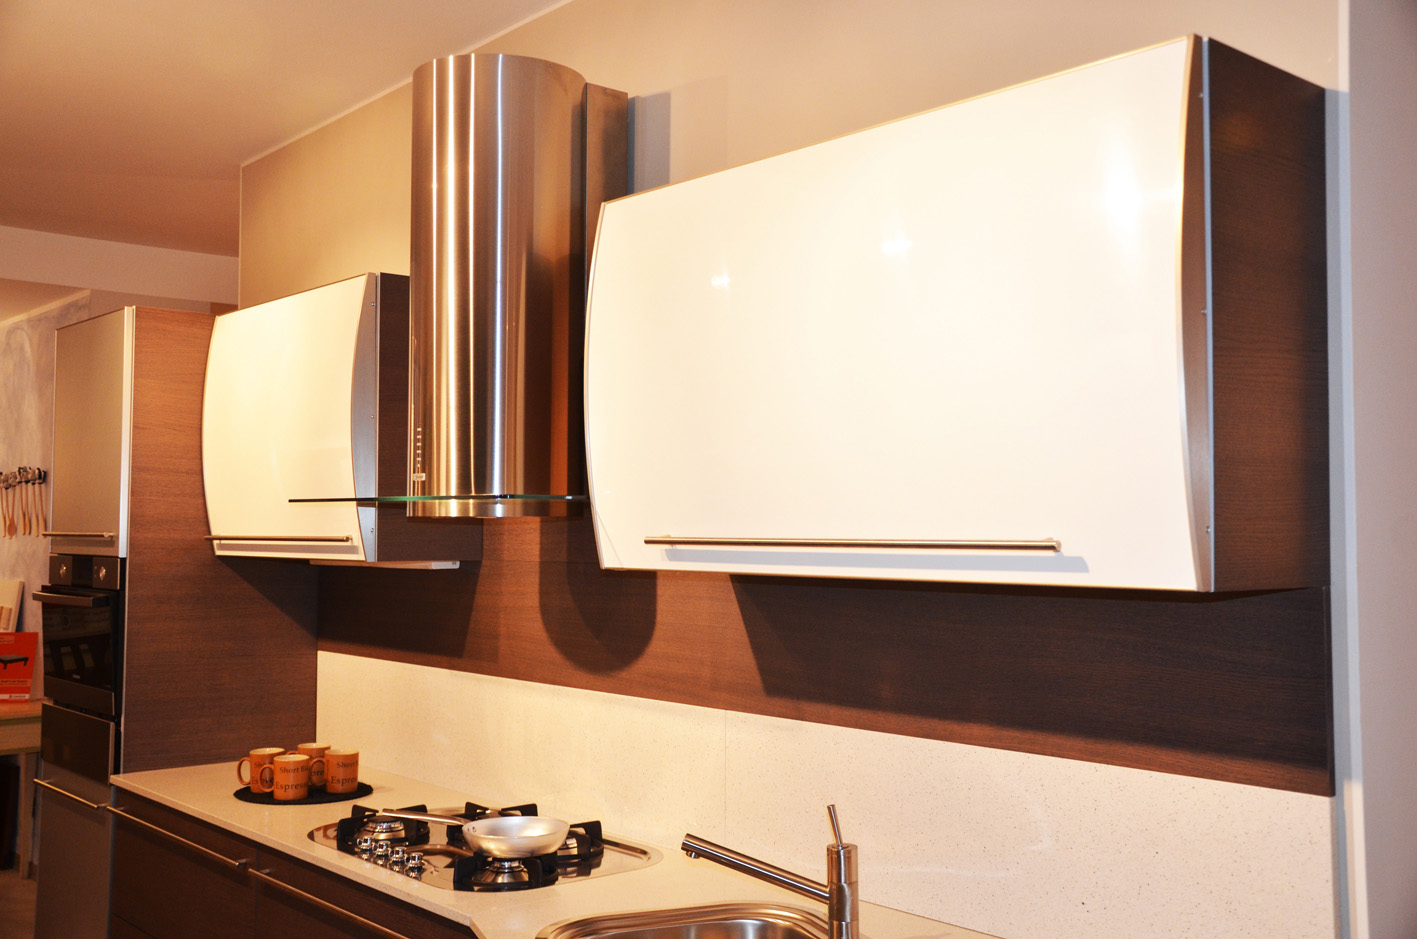 Cucina bianca e legno wengh id 176347 - Cucina 1000 euro ...